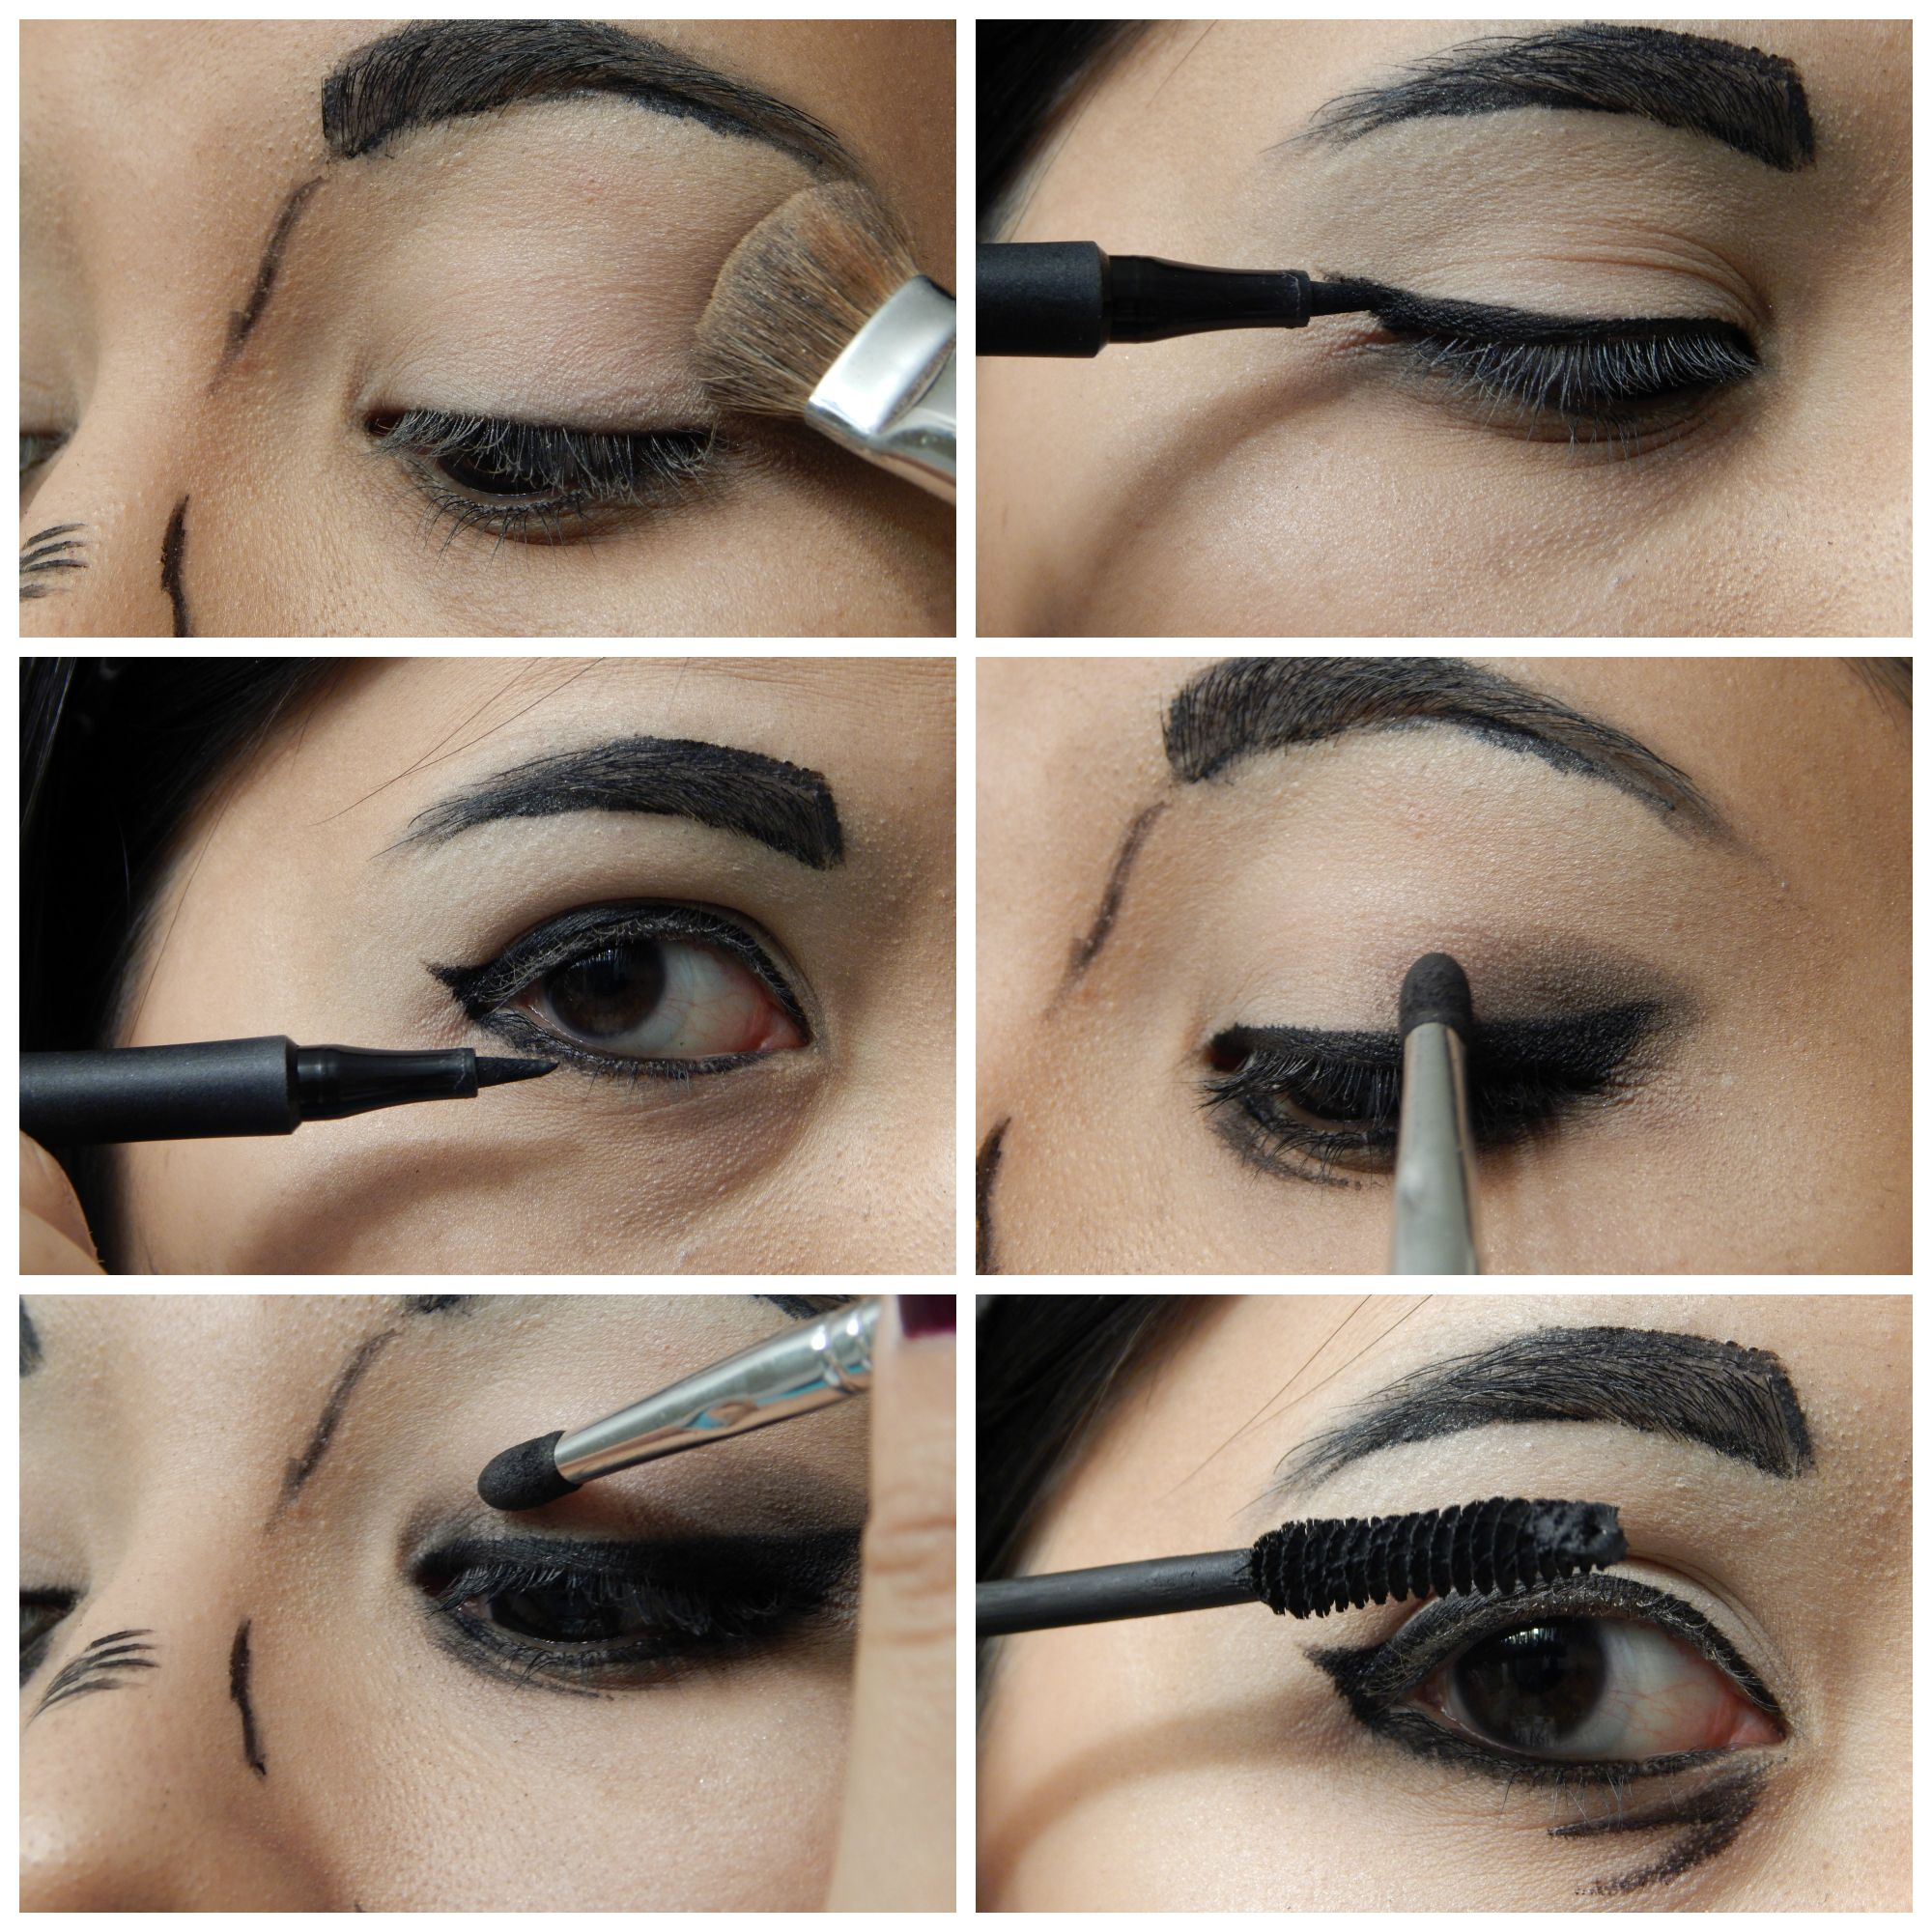 Cel shading tutorial choice image any tutorial examples cell shading makeup tutorial decorativestyle cosplay make up tutorial cel shading comic book hair nails baditri baditri Gallery